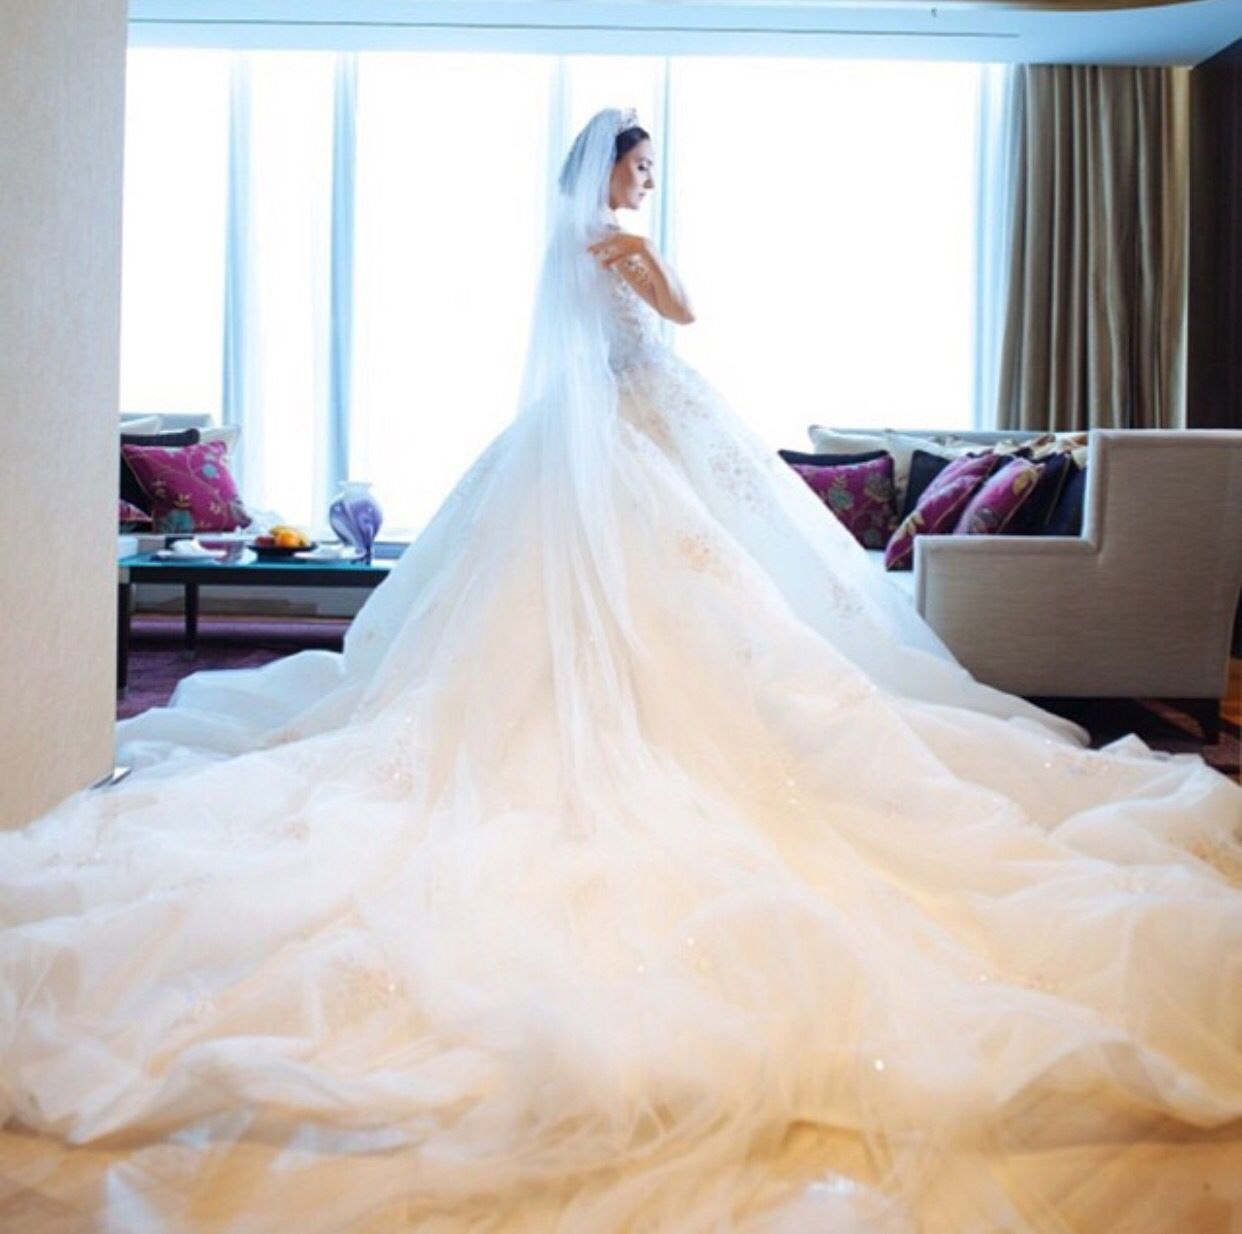 Nuttwarinthorn Ch wedding dress